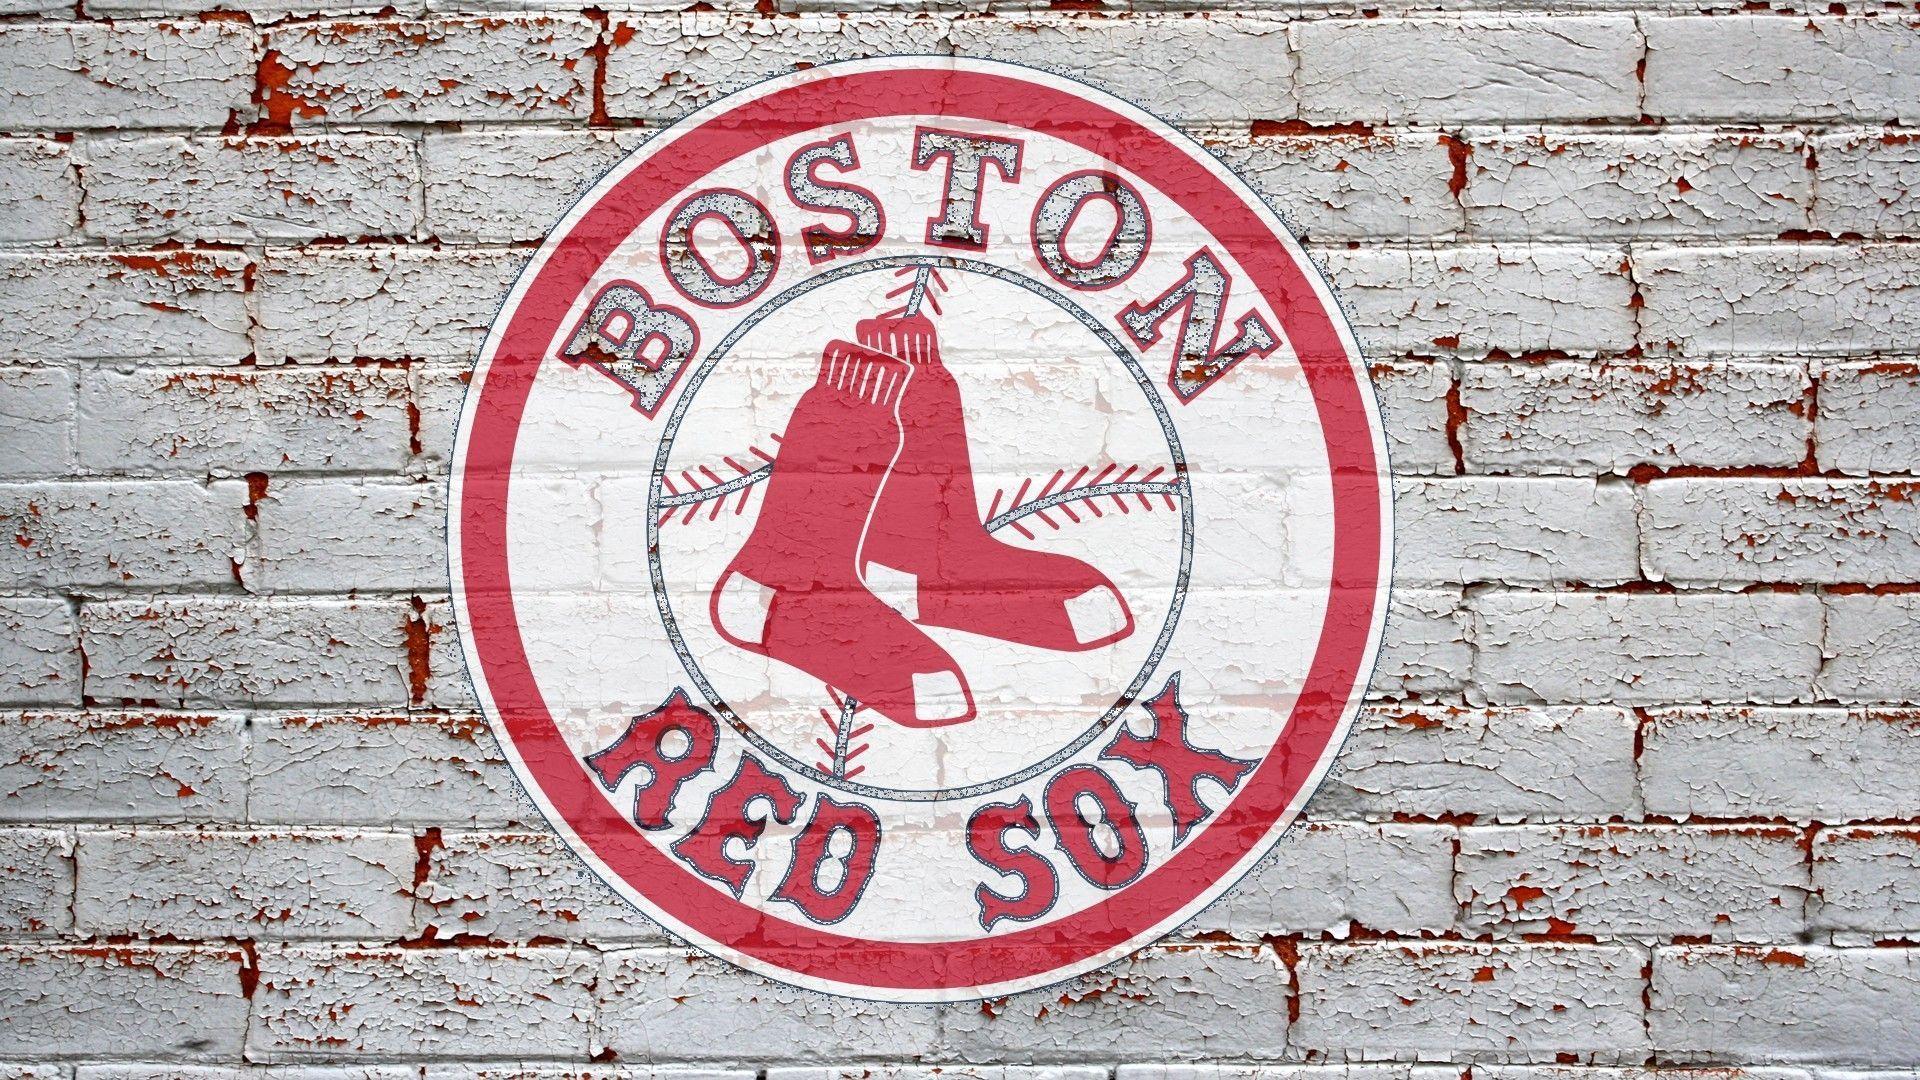 Source Red Sox Background RZ1VI49jpg Wallperiocom 1920x1080